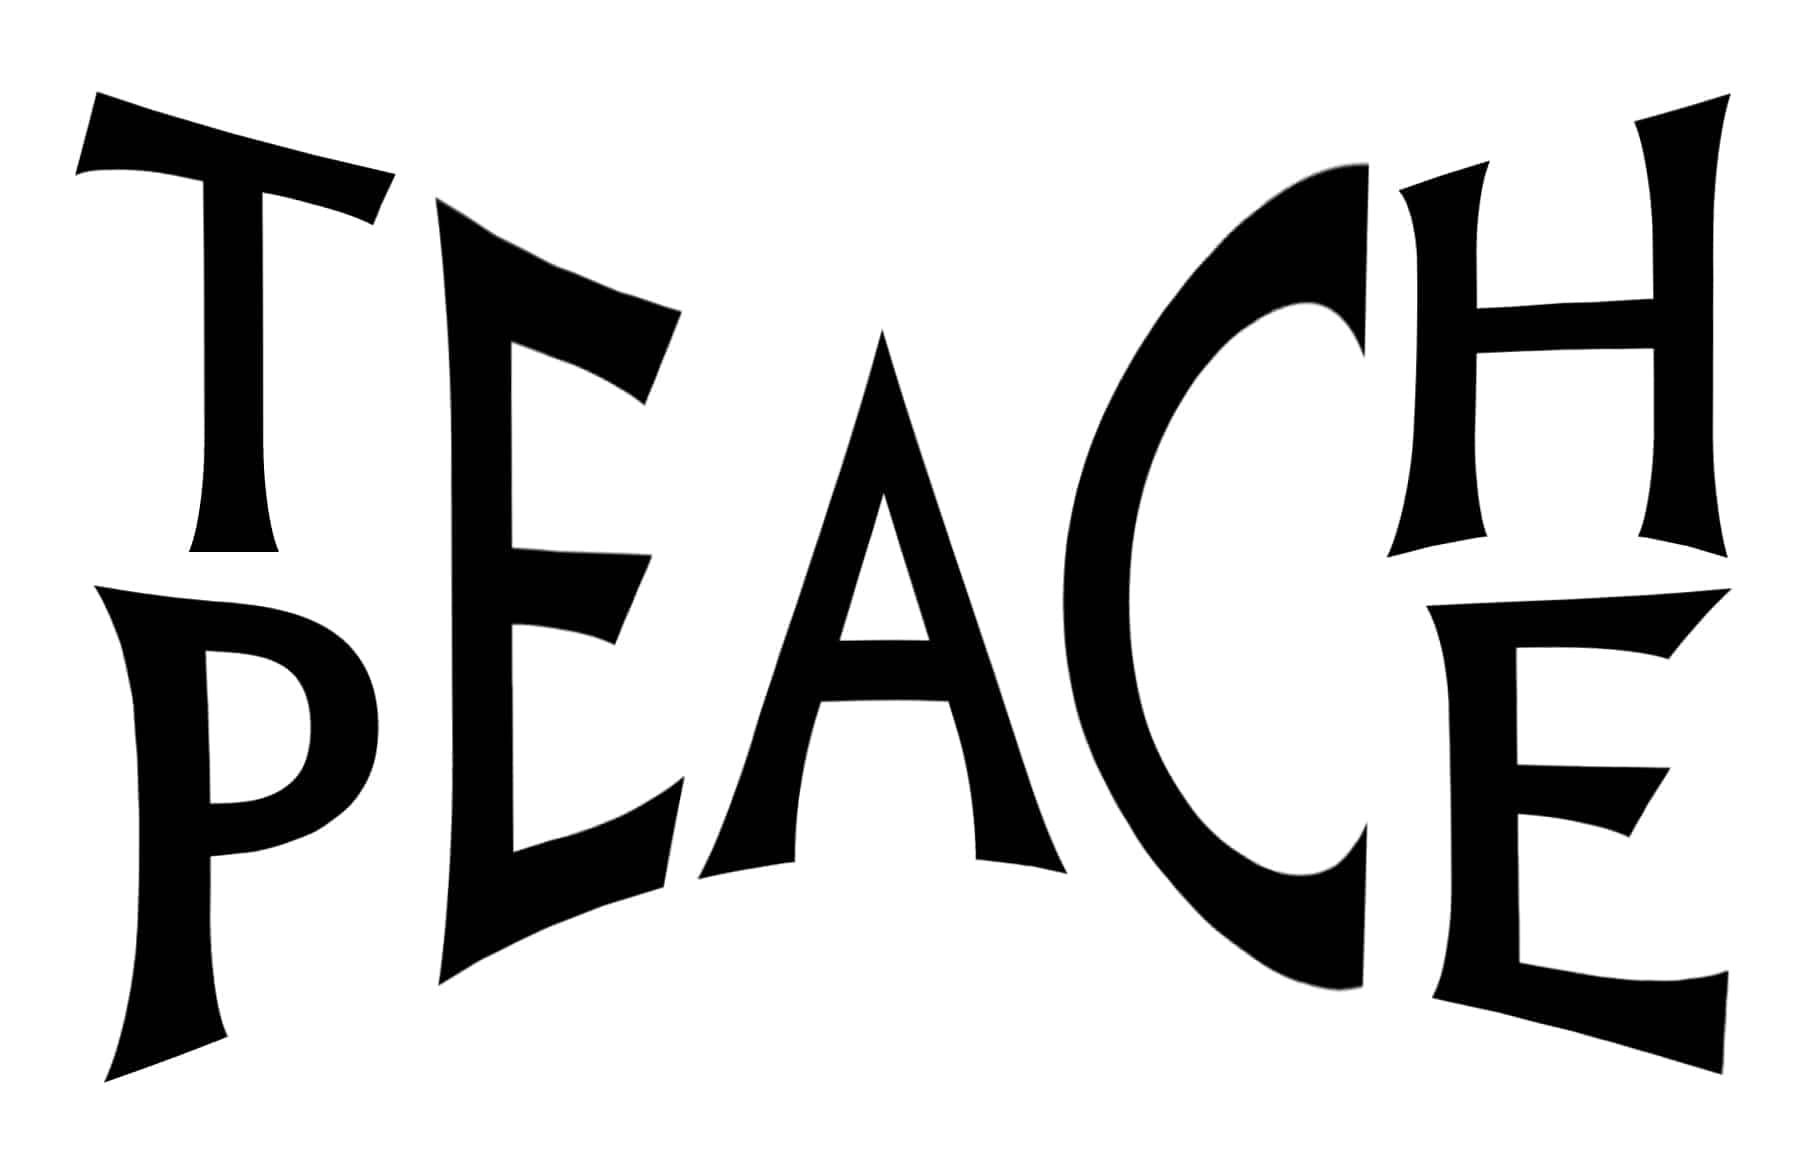 Free Teach Peace SVG File